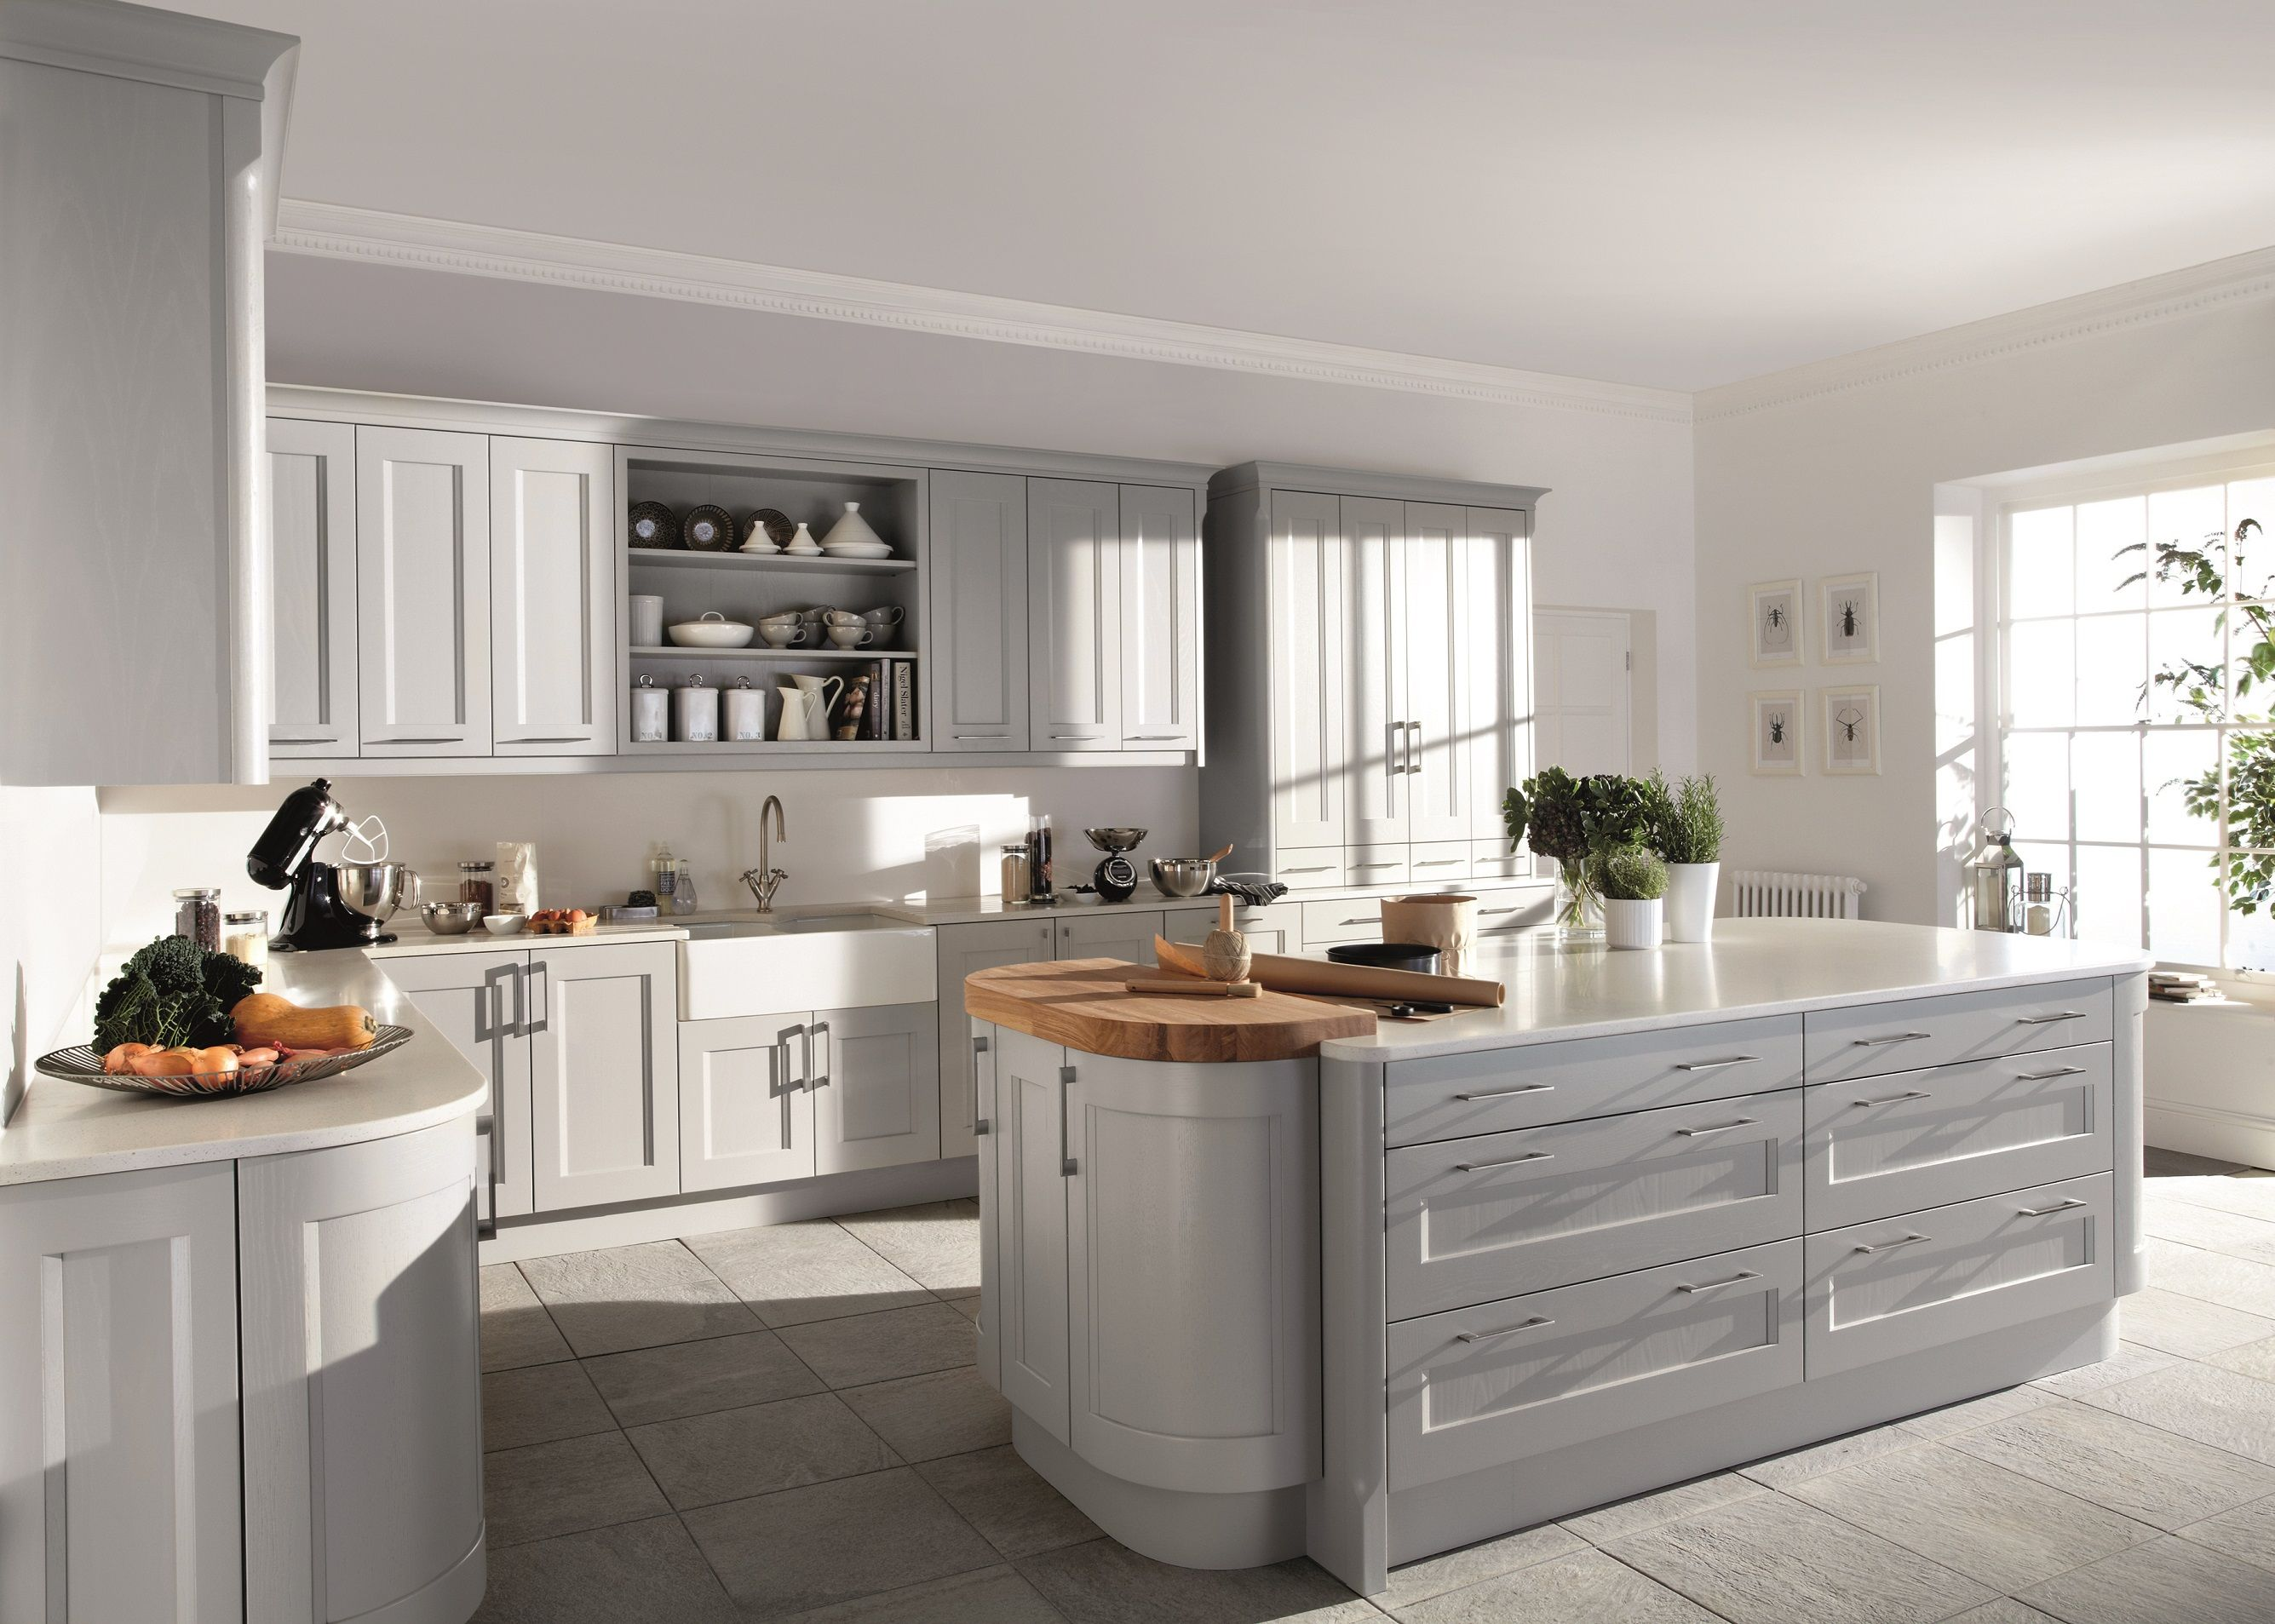 wood shaker modern american cordovan ash black l cabinet knobs rustic door cabinets kitchen standard